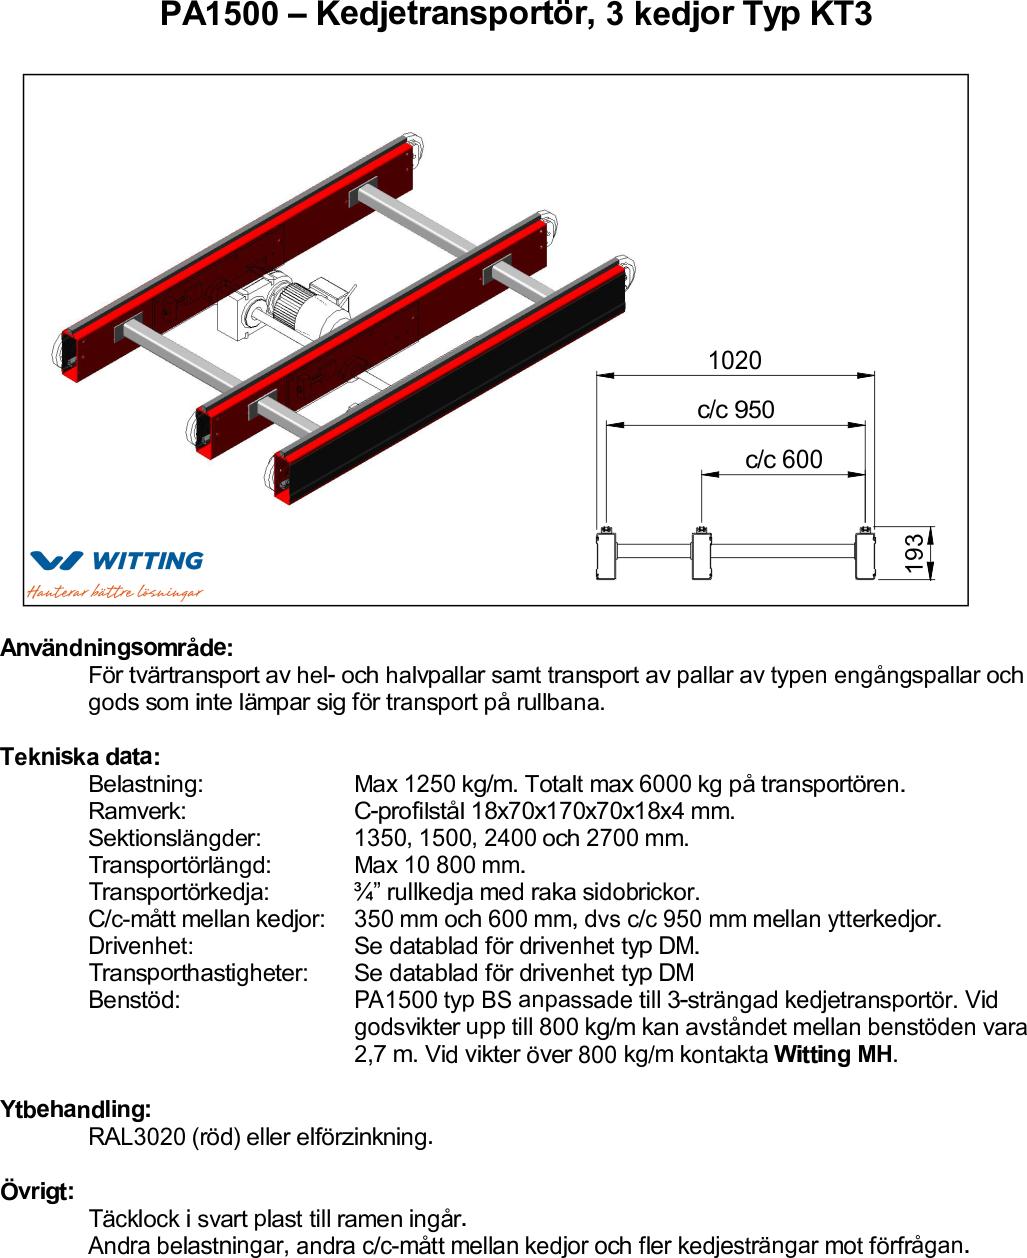 PA1500 – Kedjetransportör, 3 kedjor Typ KT3